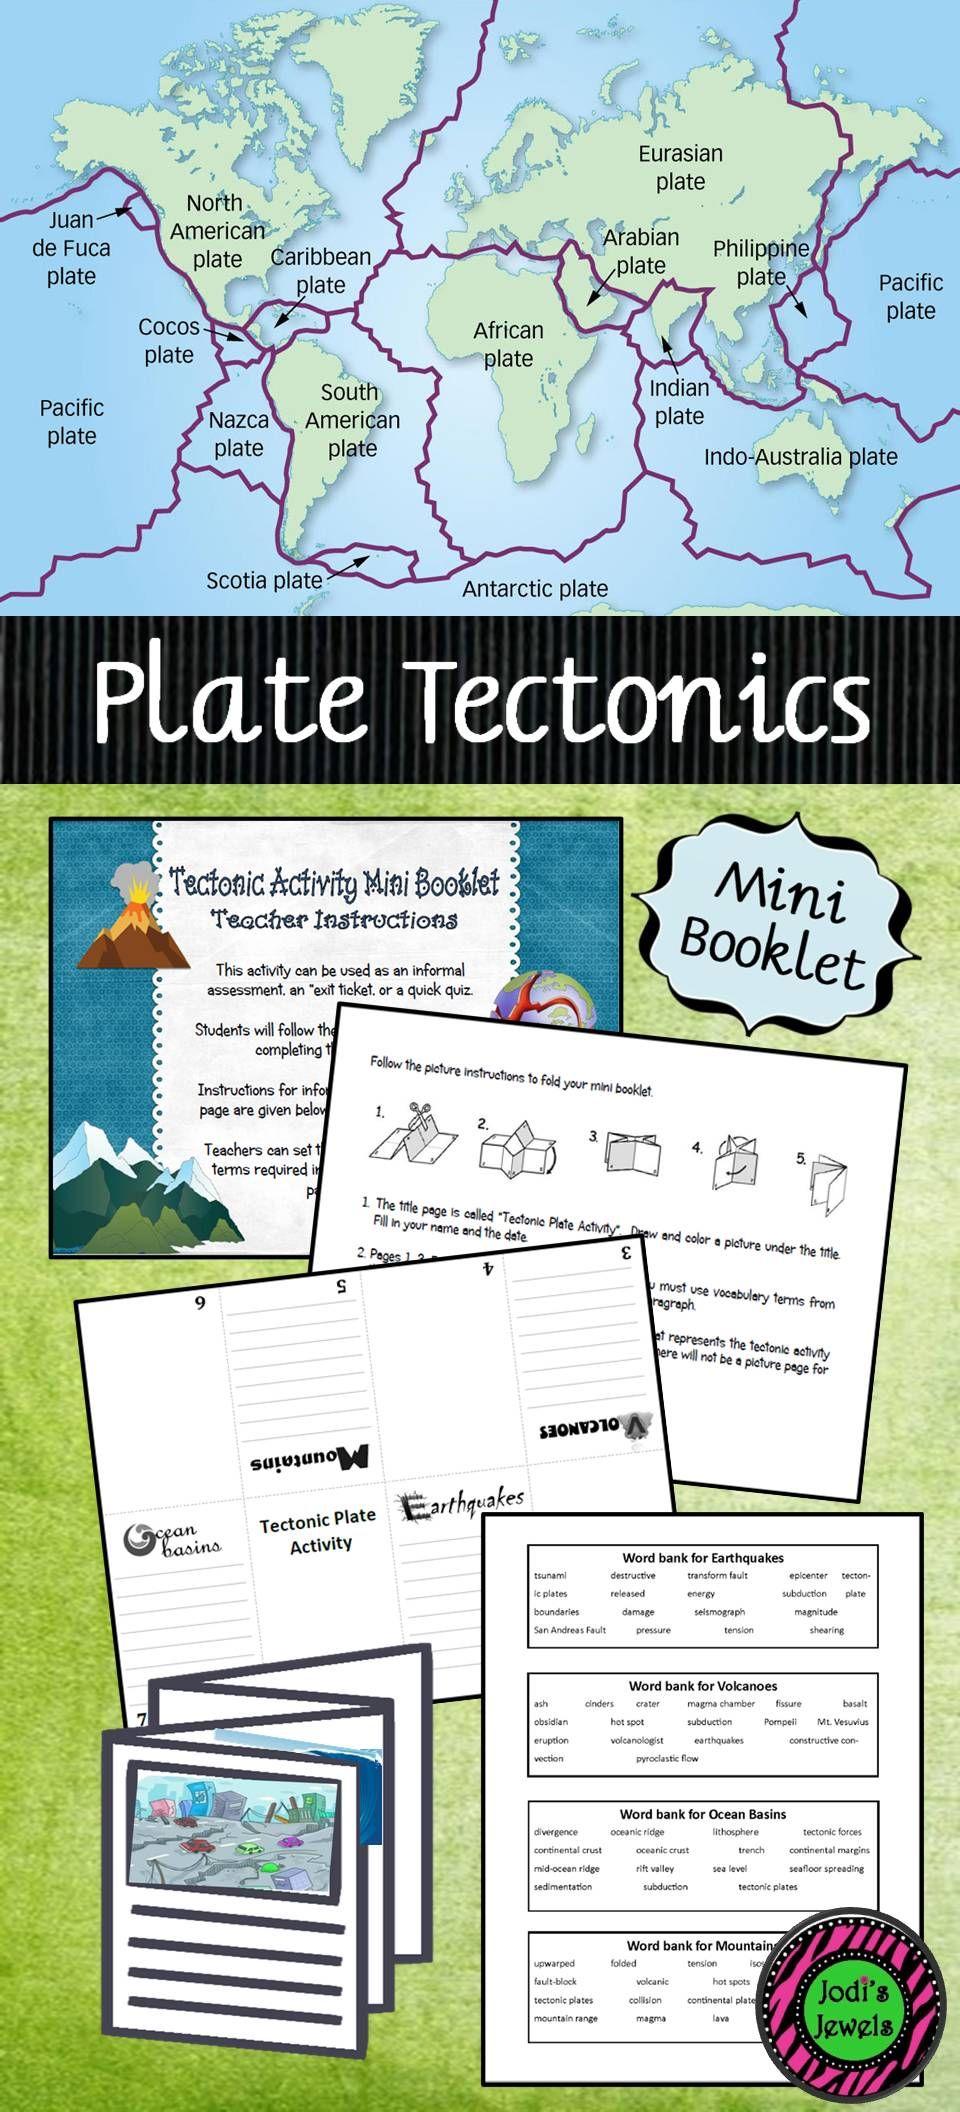 Tectonic Activity Mini Booklet Elementary Science Activities Activities Elementary School Science [ 2112 x 960 Pixel ]